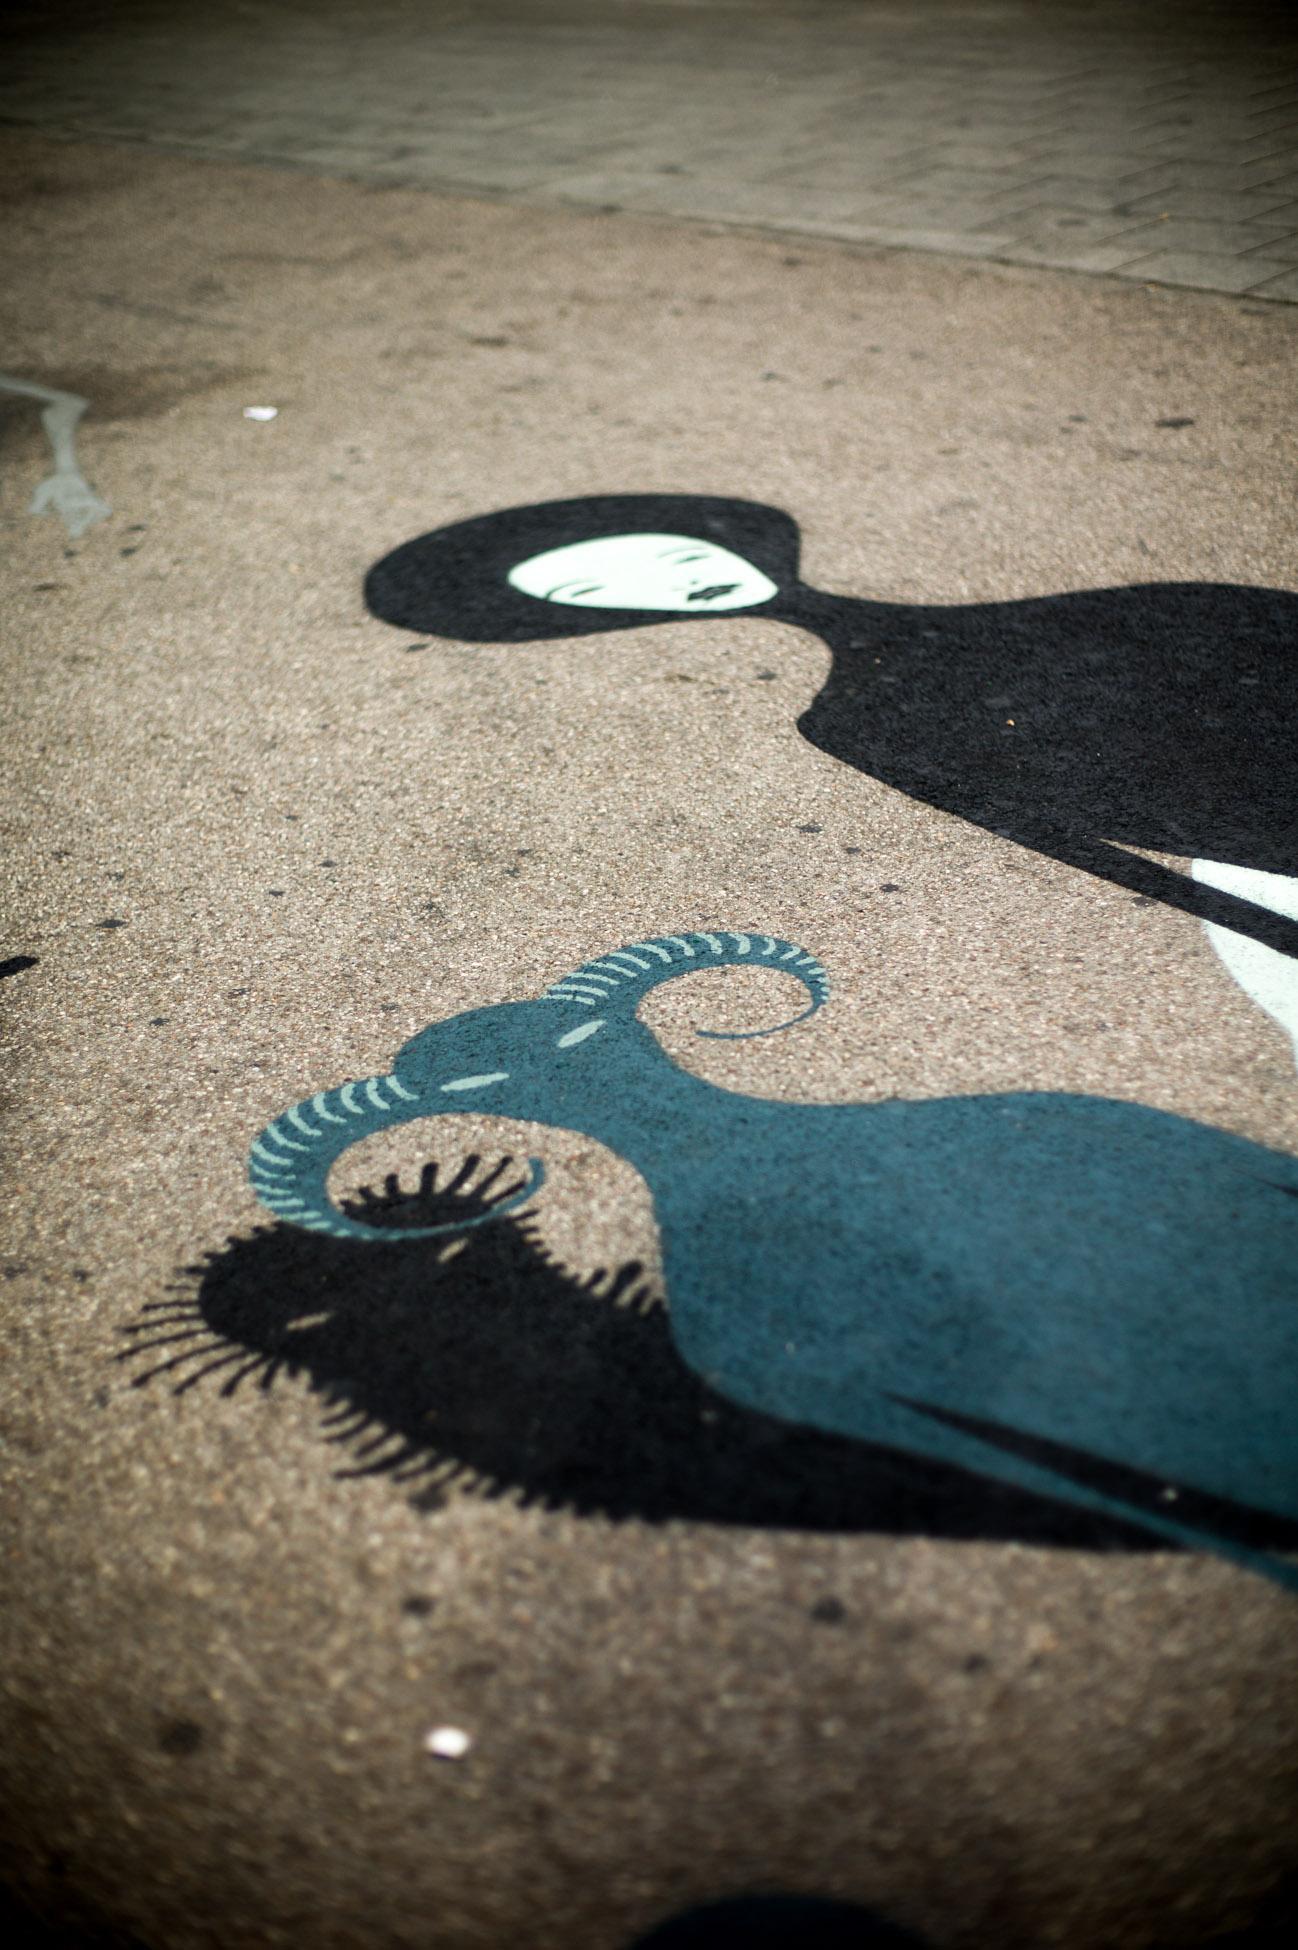 Streetart_Brazil_Herbert_Baglione_2013_Frankfurt (16 von 20)